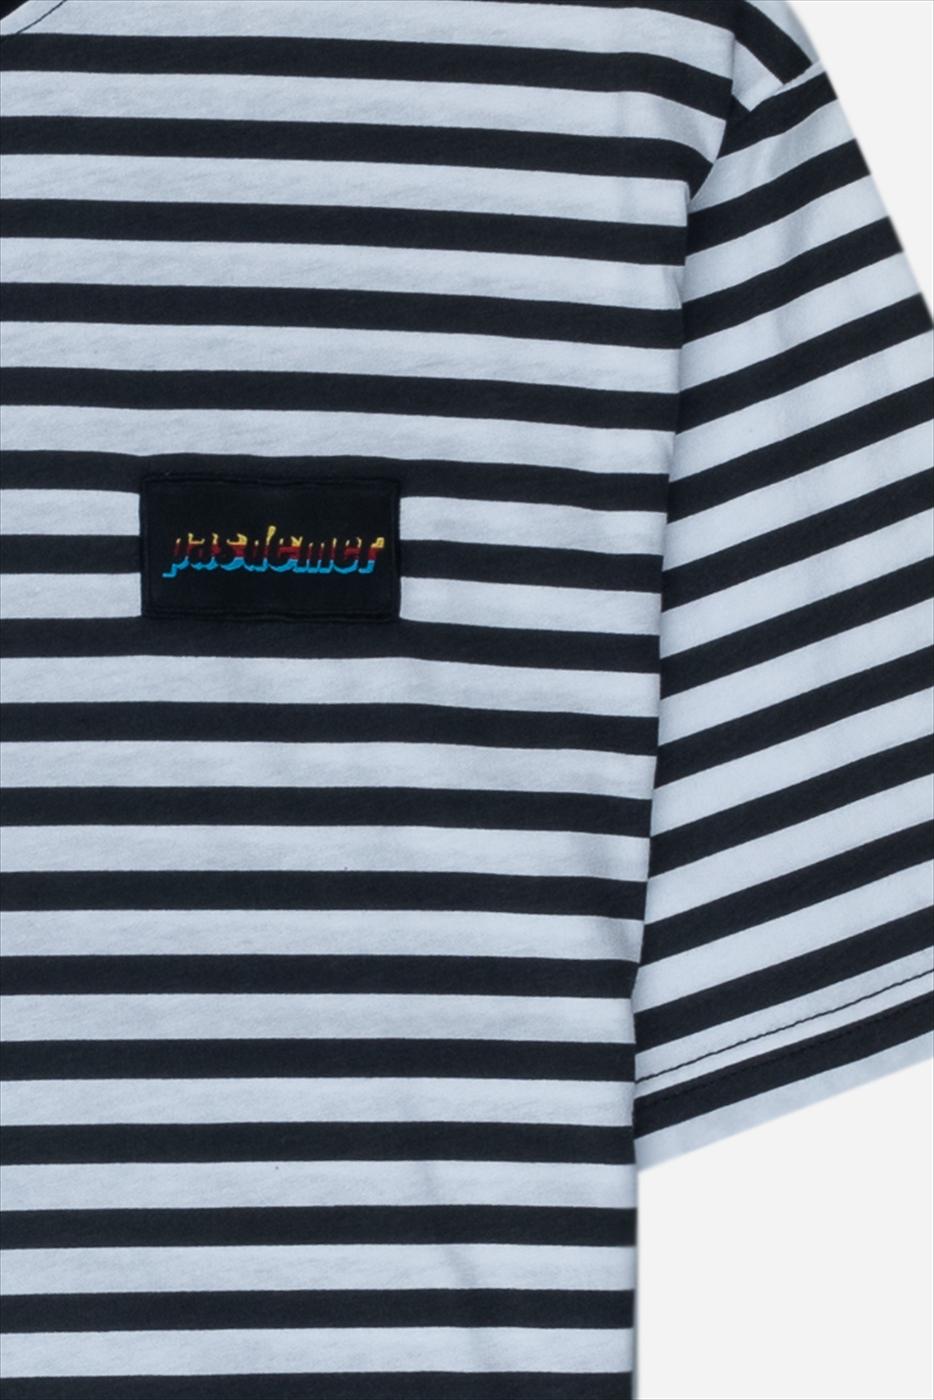 【PAS DE MER/パドゥメ】HOLIDAY T-SHIRT Tシャツ / BLACK/WHITE STRIPES